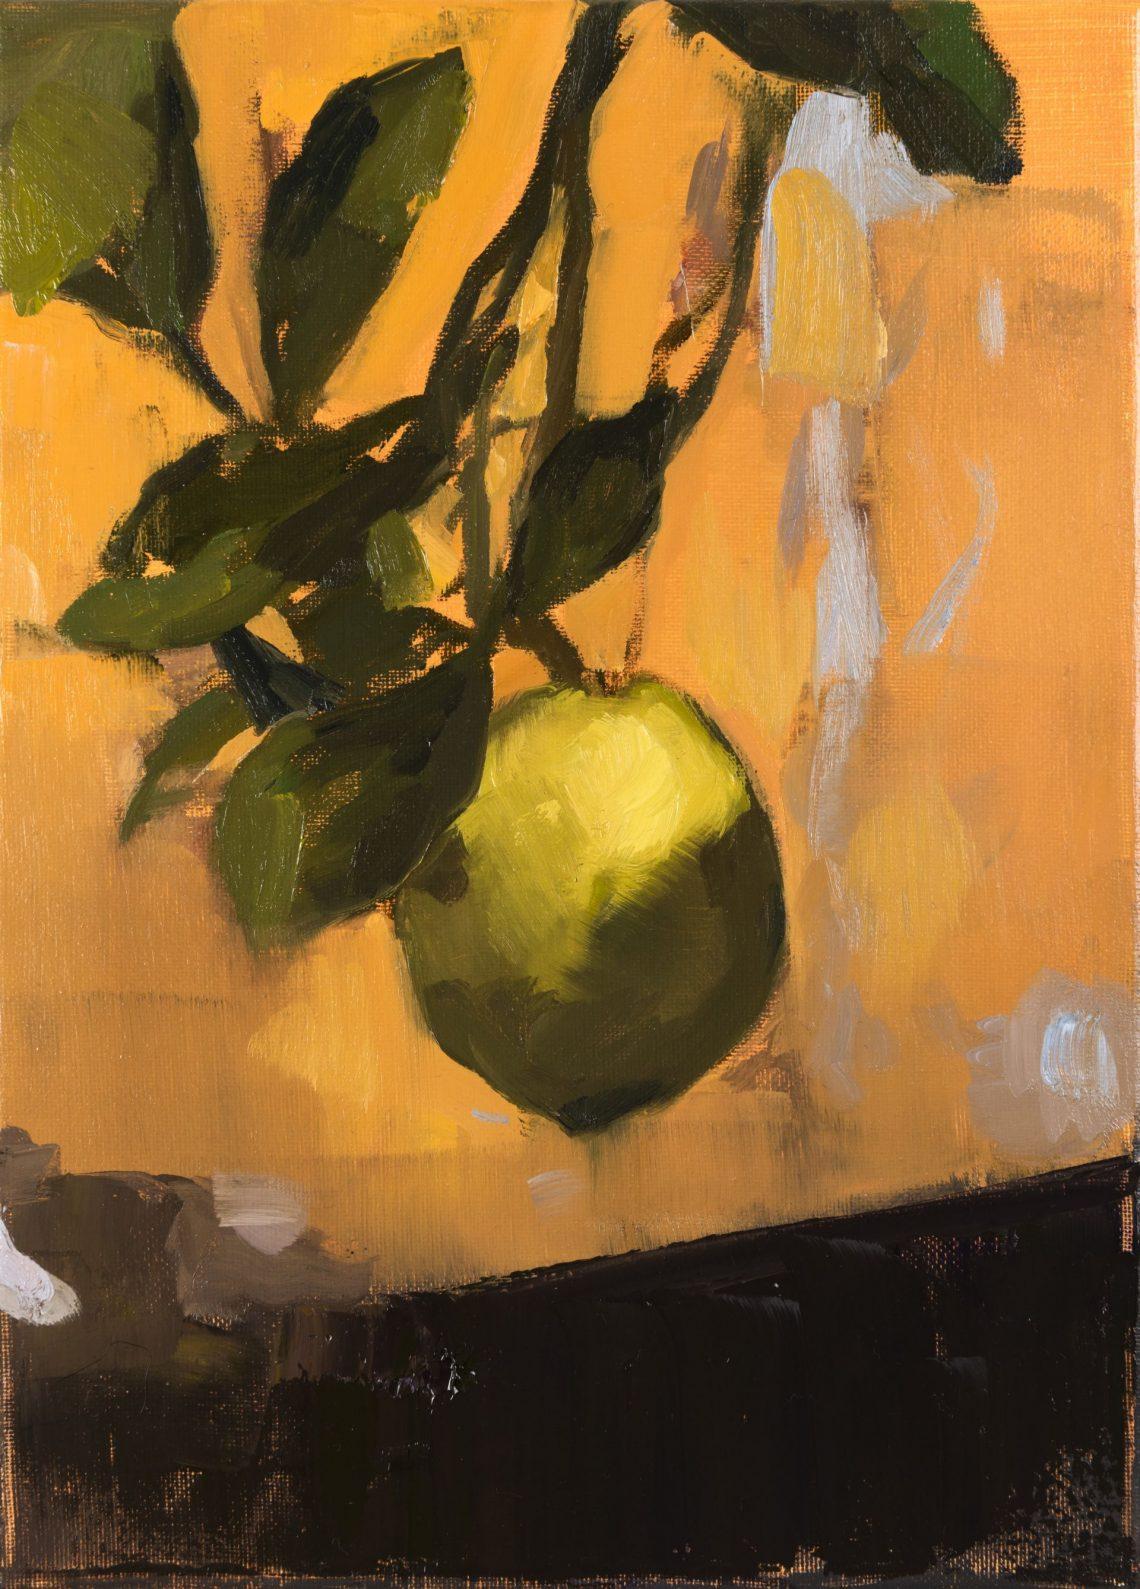 Peinture de Chloé Tiravy